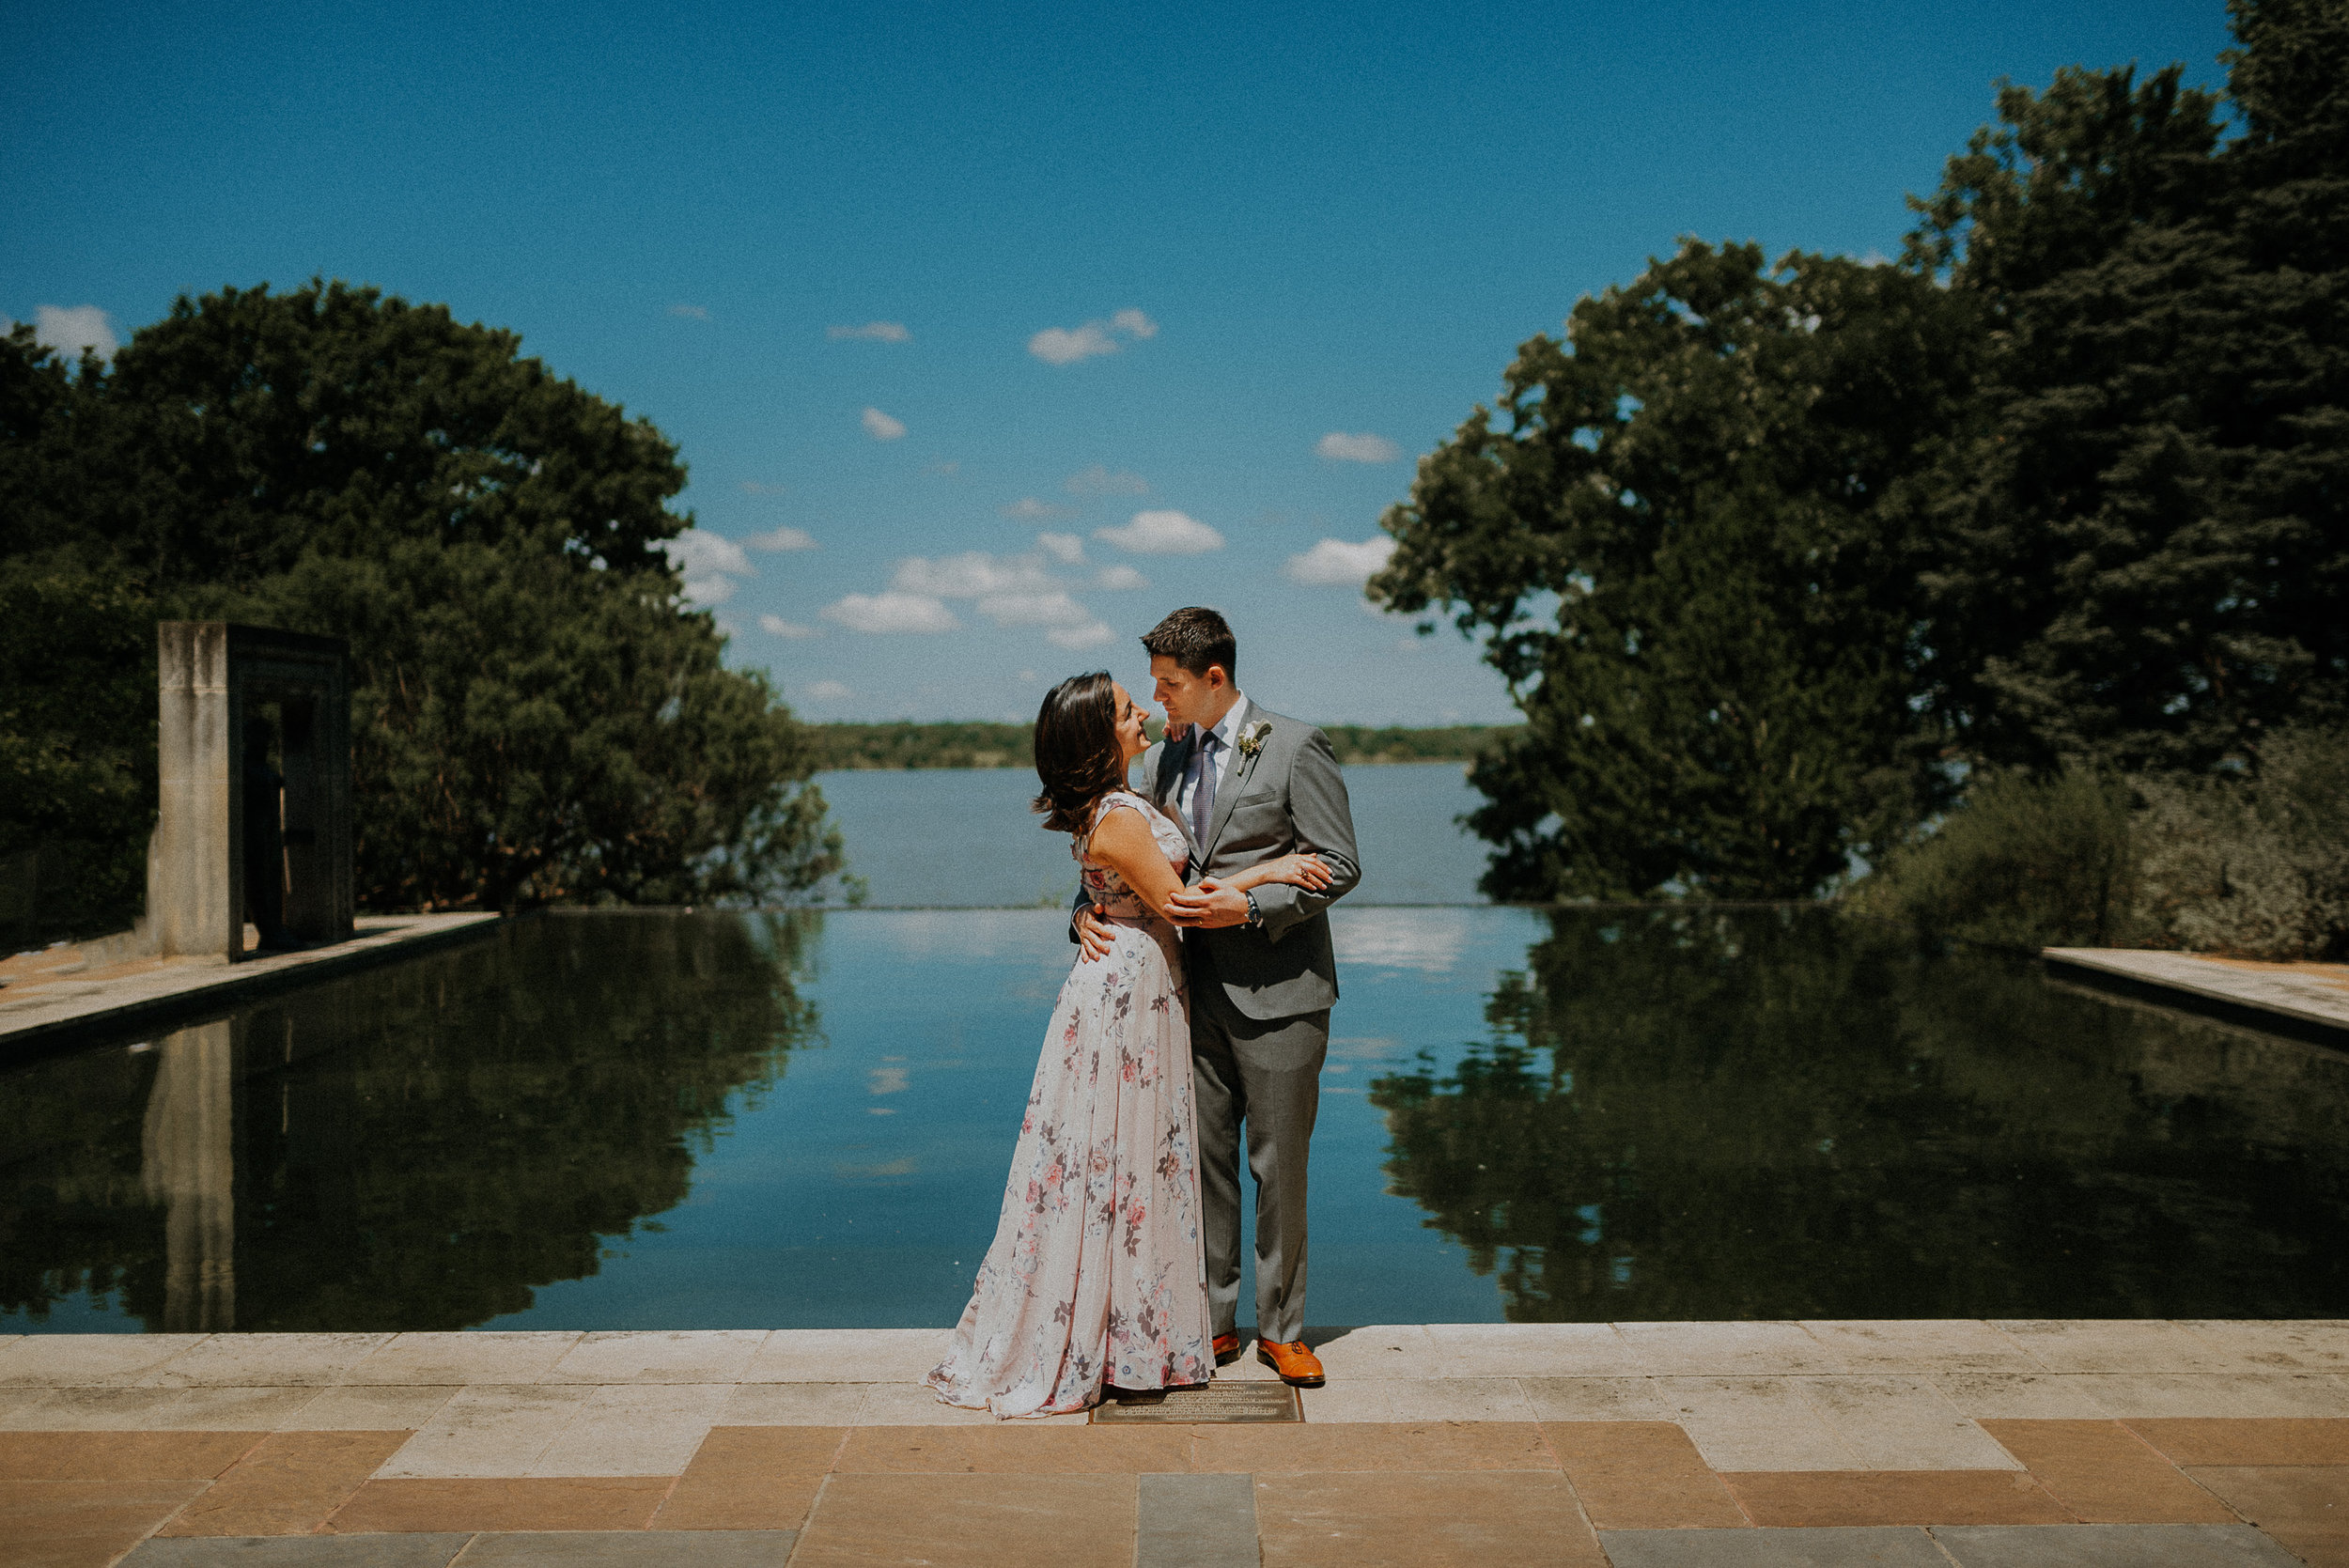 Dallas-fort-worth-wedding-photographer-dallas-arboretum-intimate-wedding-dallas-texas-27